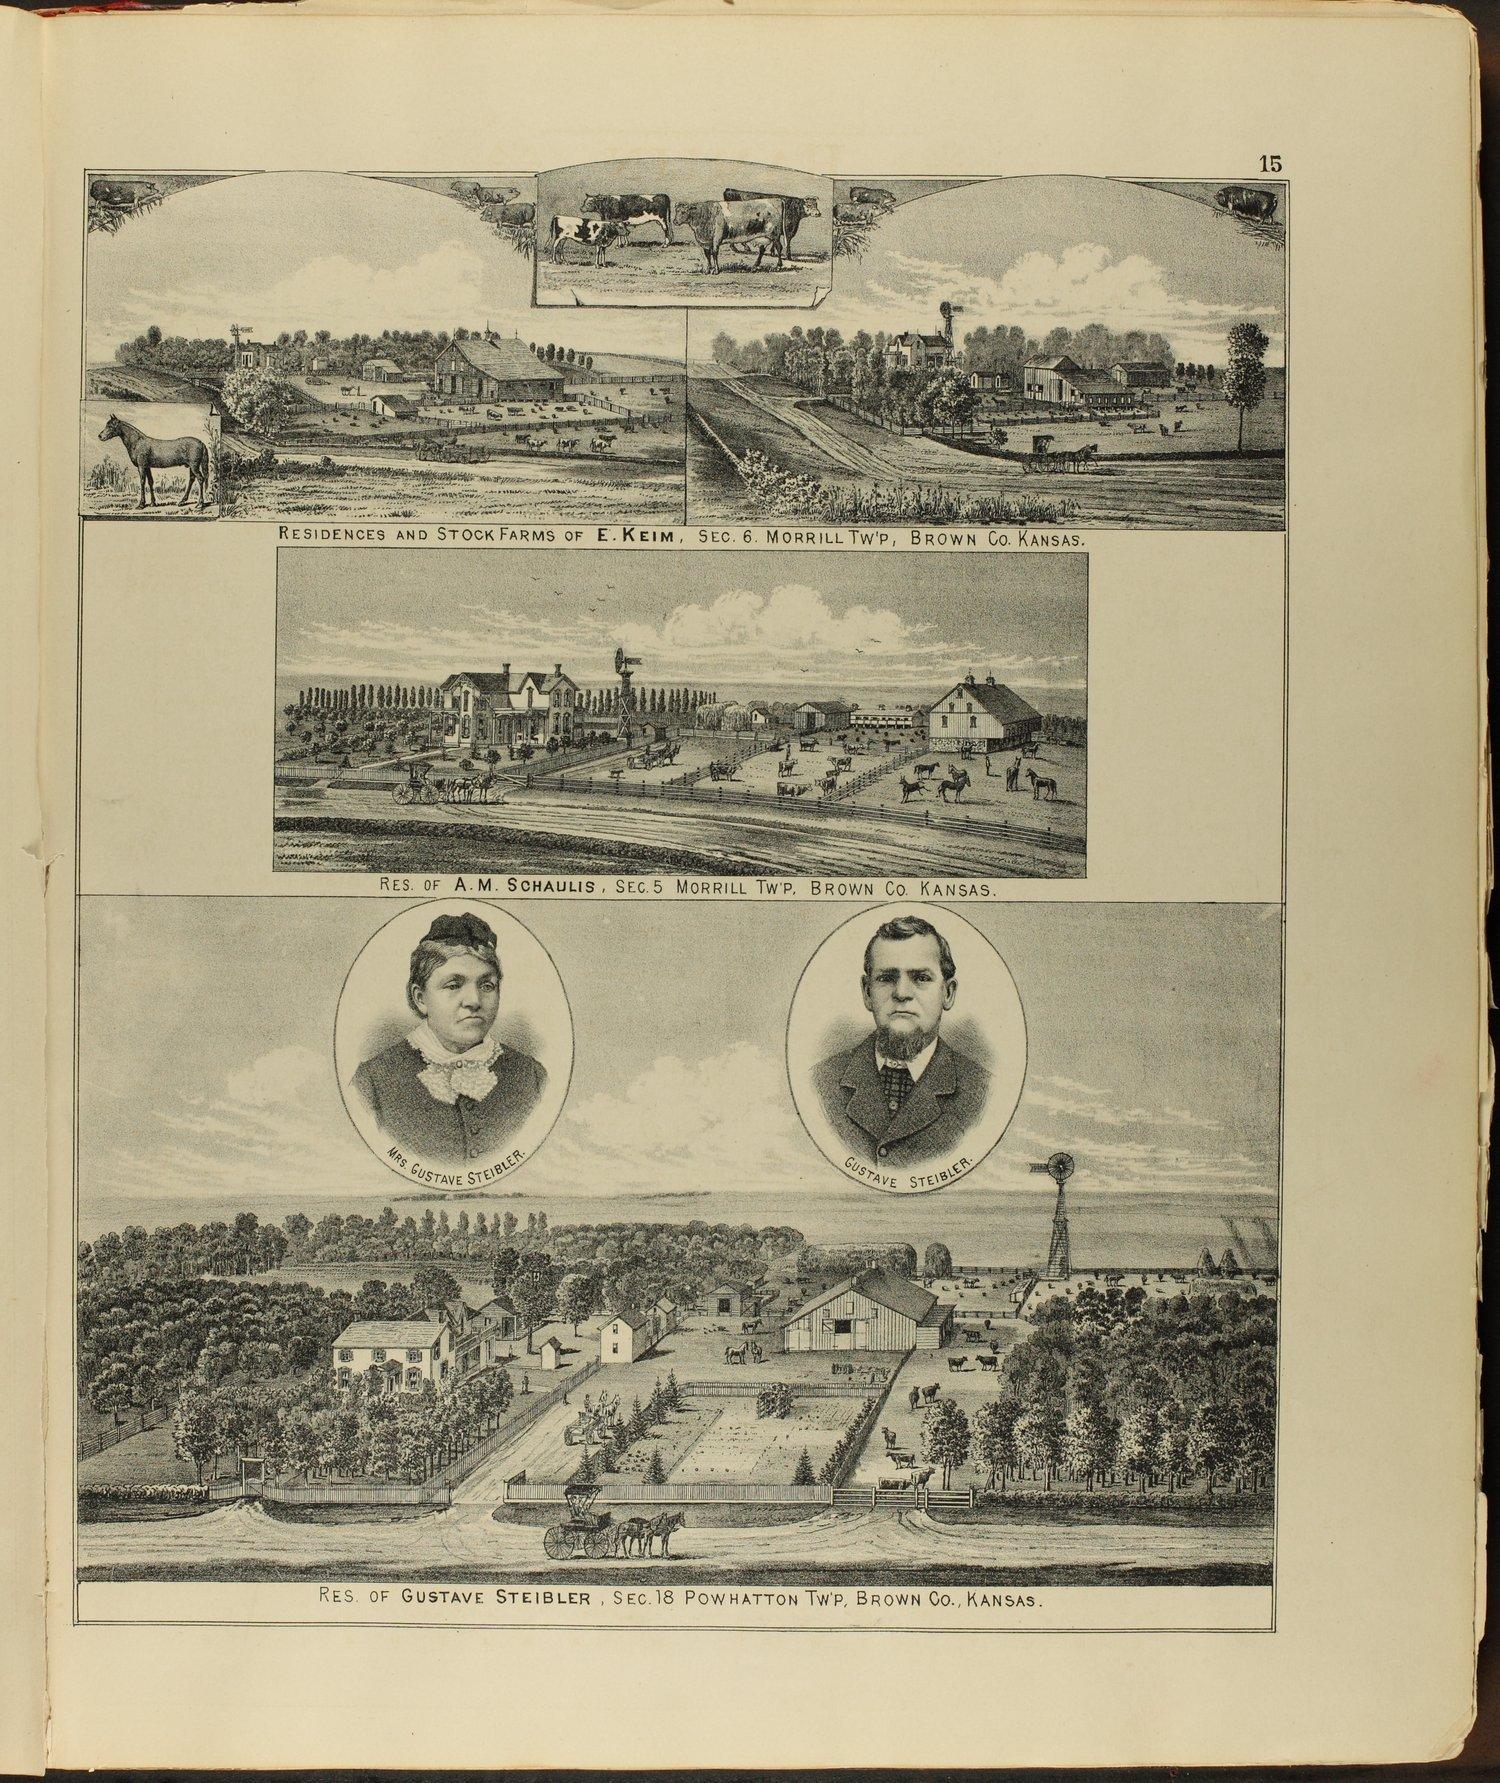 Meacham's illustrated atlas of Brown and Nemaha counties, Kansas - 15